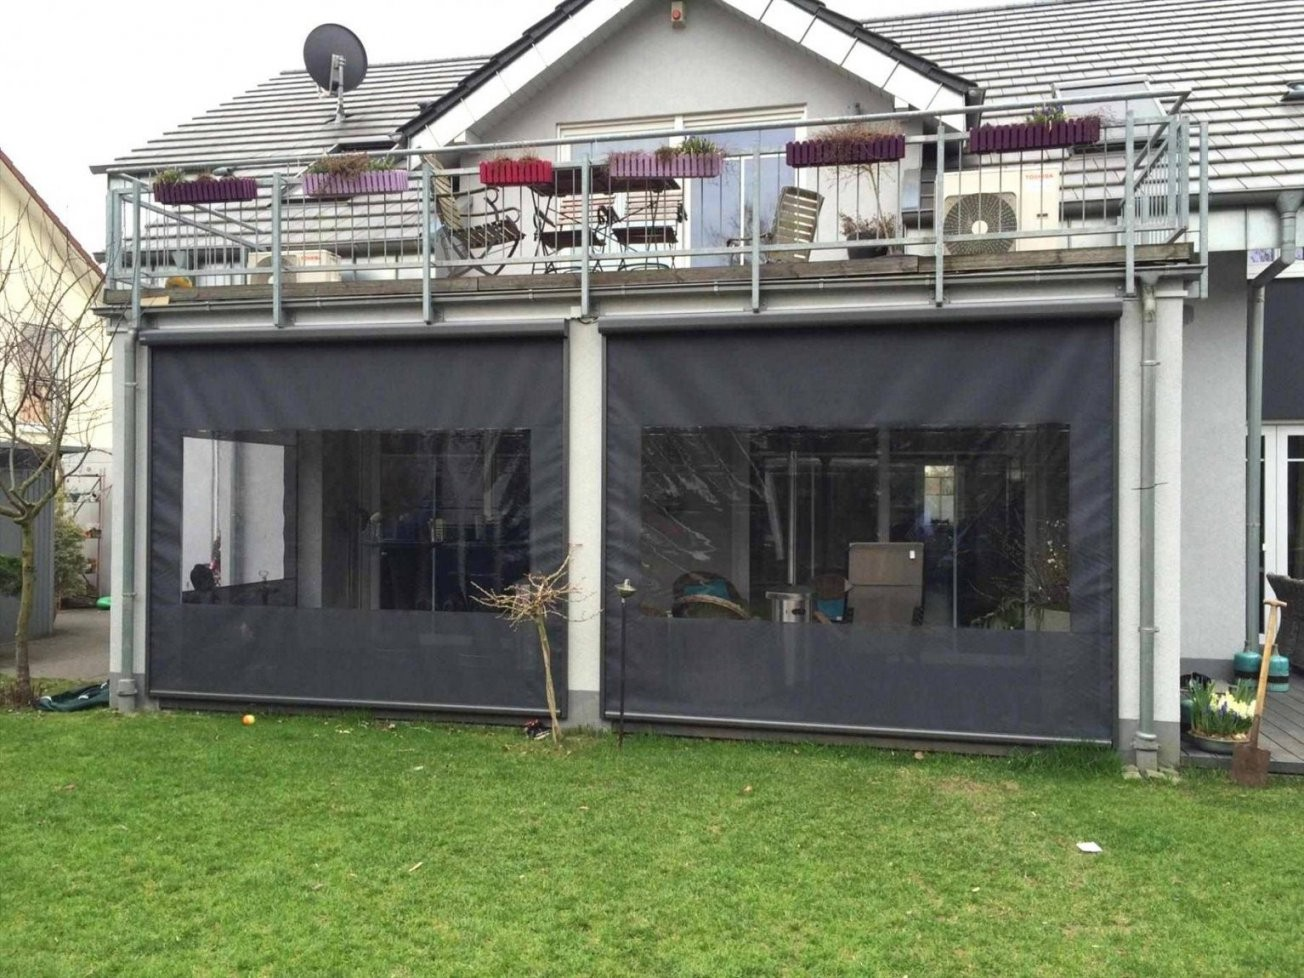 64 Inspirational Regenschutz Terrasse Selber Bauen Wccp Von Balkon von Regenschutz Terrasse Selber Bauen Bild